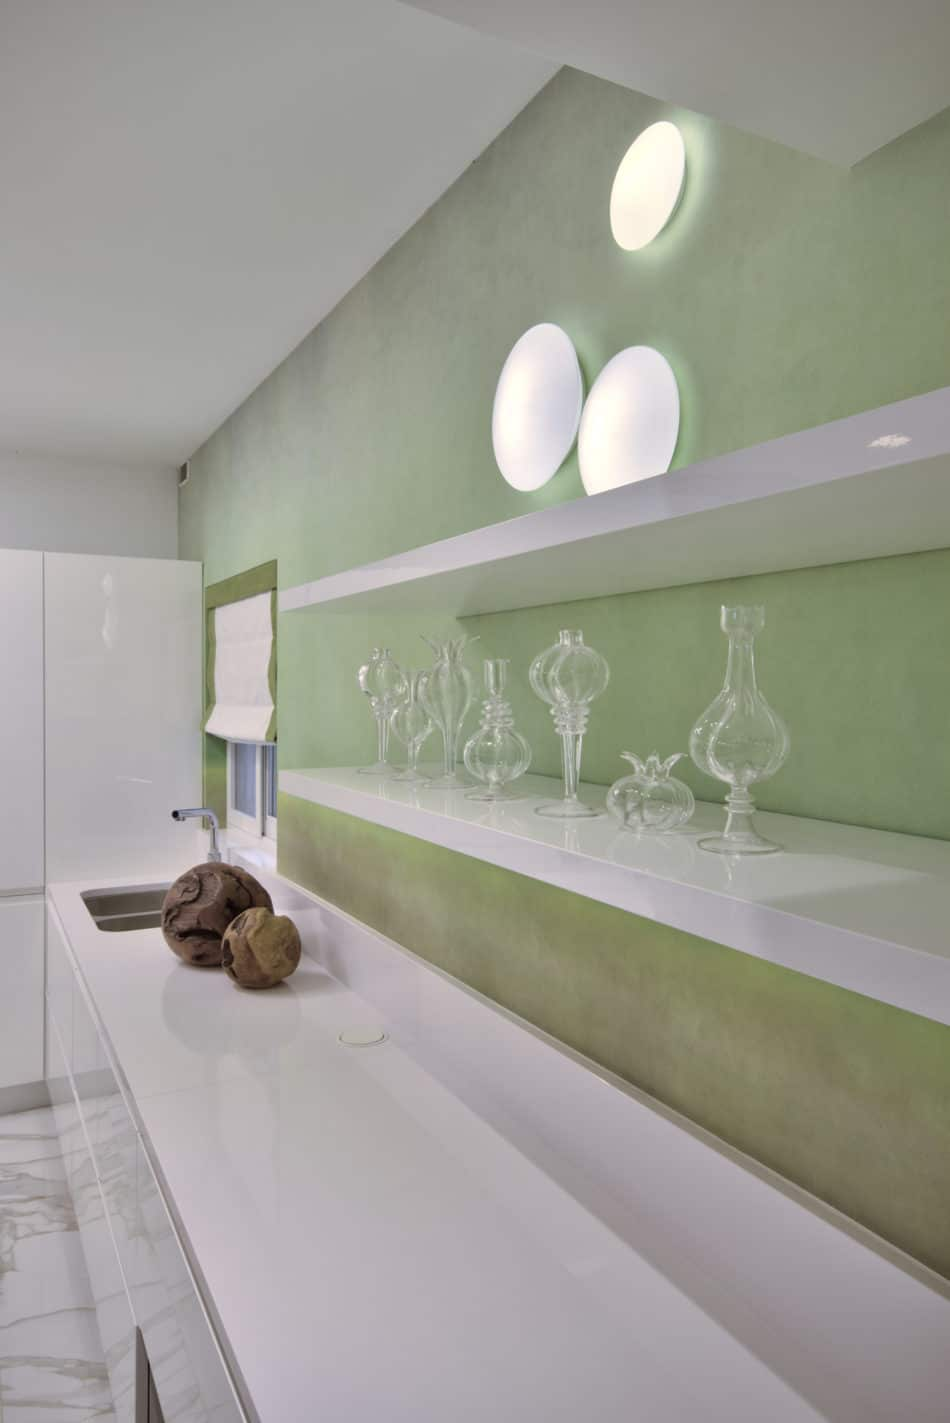 Kitchen – wallpaper feature, accessories, wall light feature